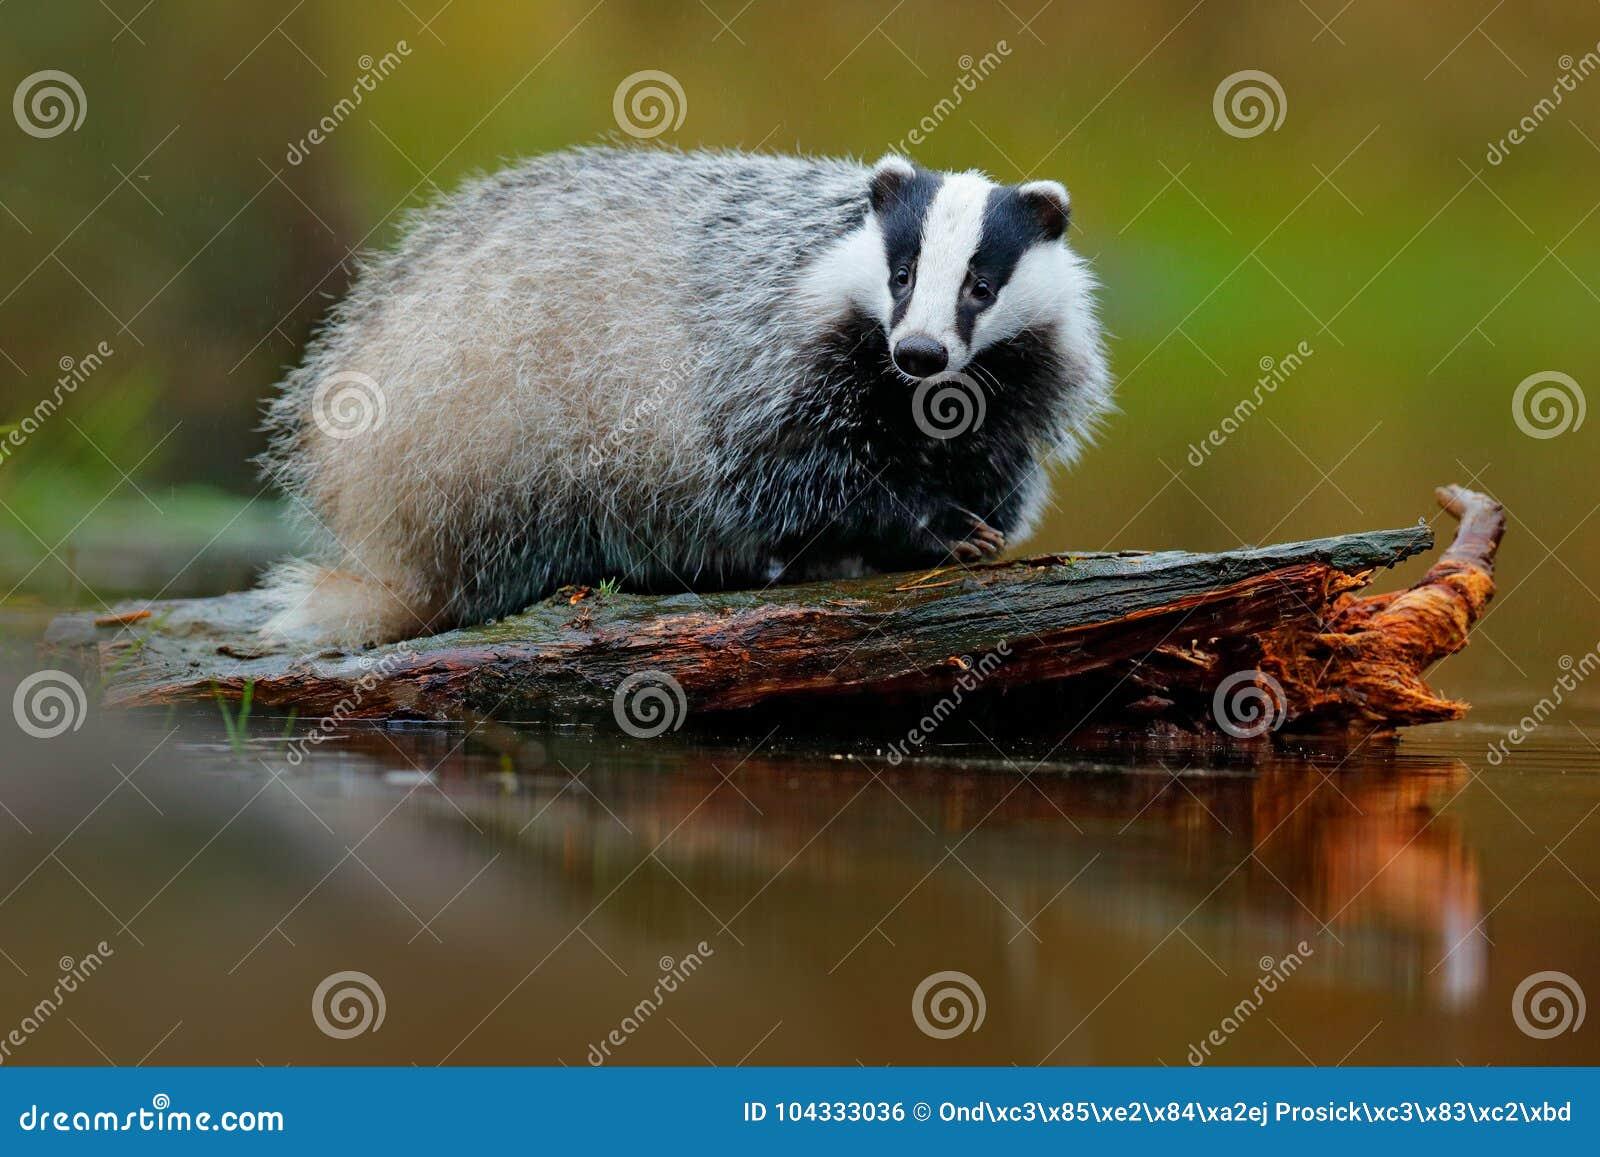 Badger in lake water, animal nature habitat, Germany, Europe. Wildlife scene. Wild Badger, Meles meles, animal in wood. European b